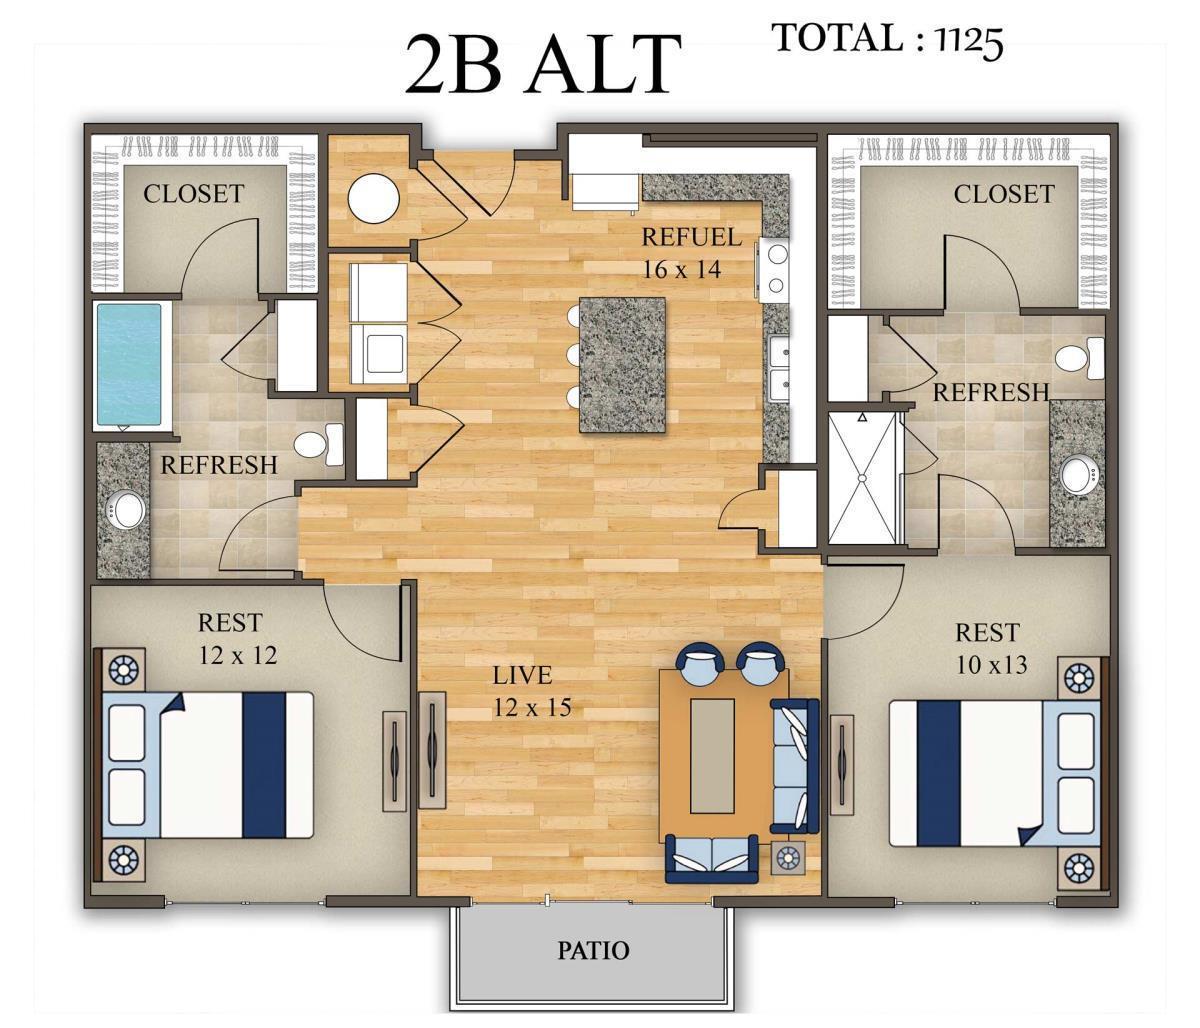 1,125 sq. ft. 2B Alt 1 floor plan